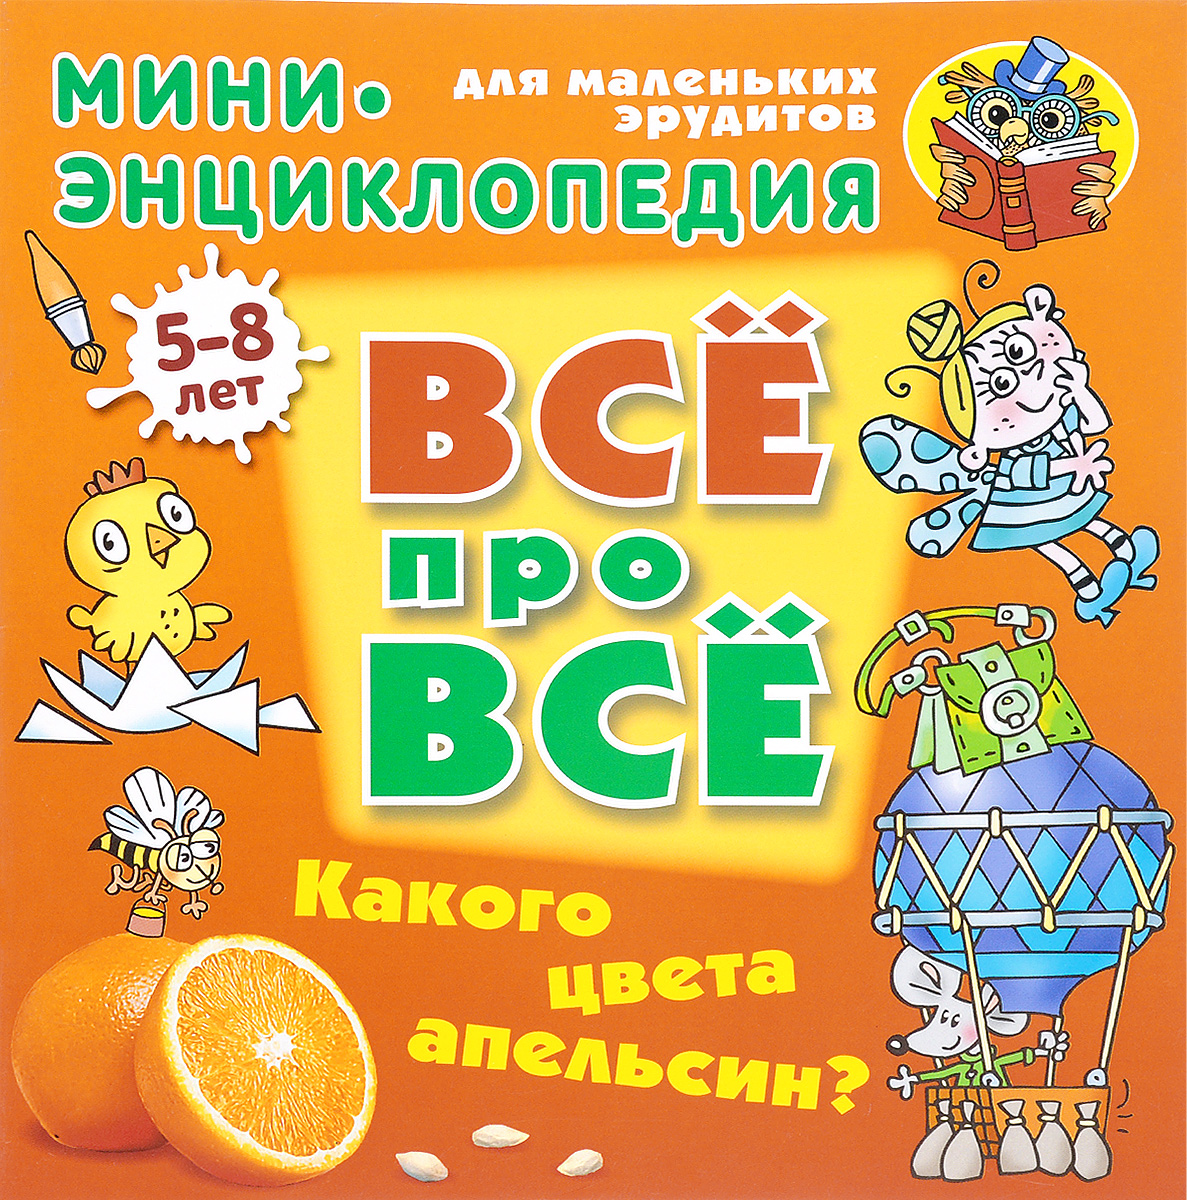 Какого цвета апельсин?